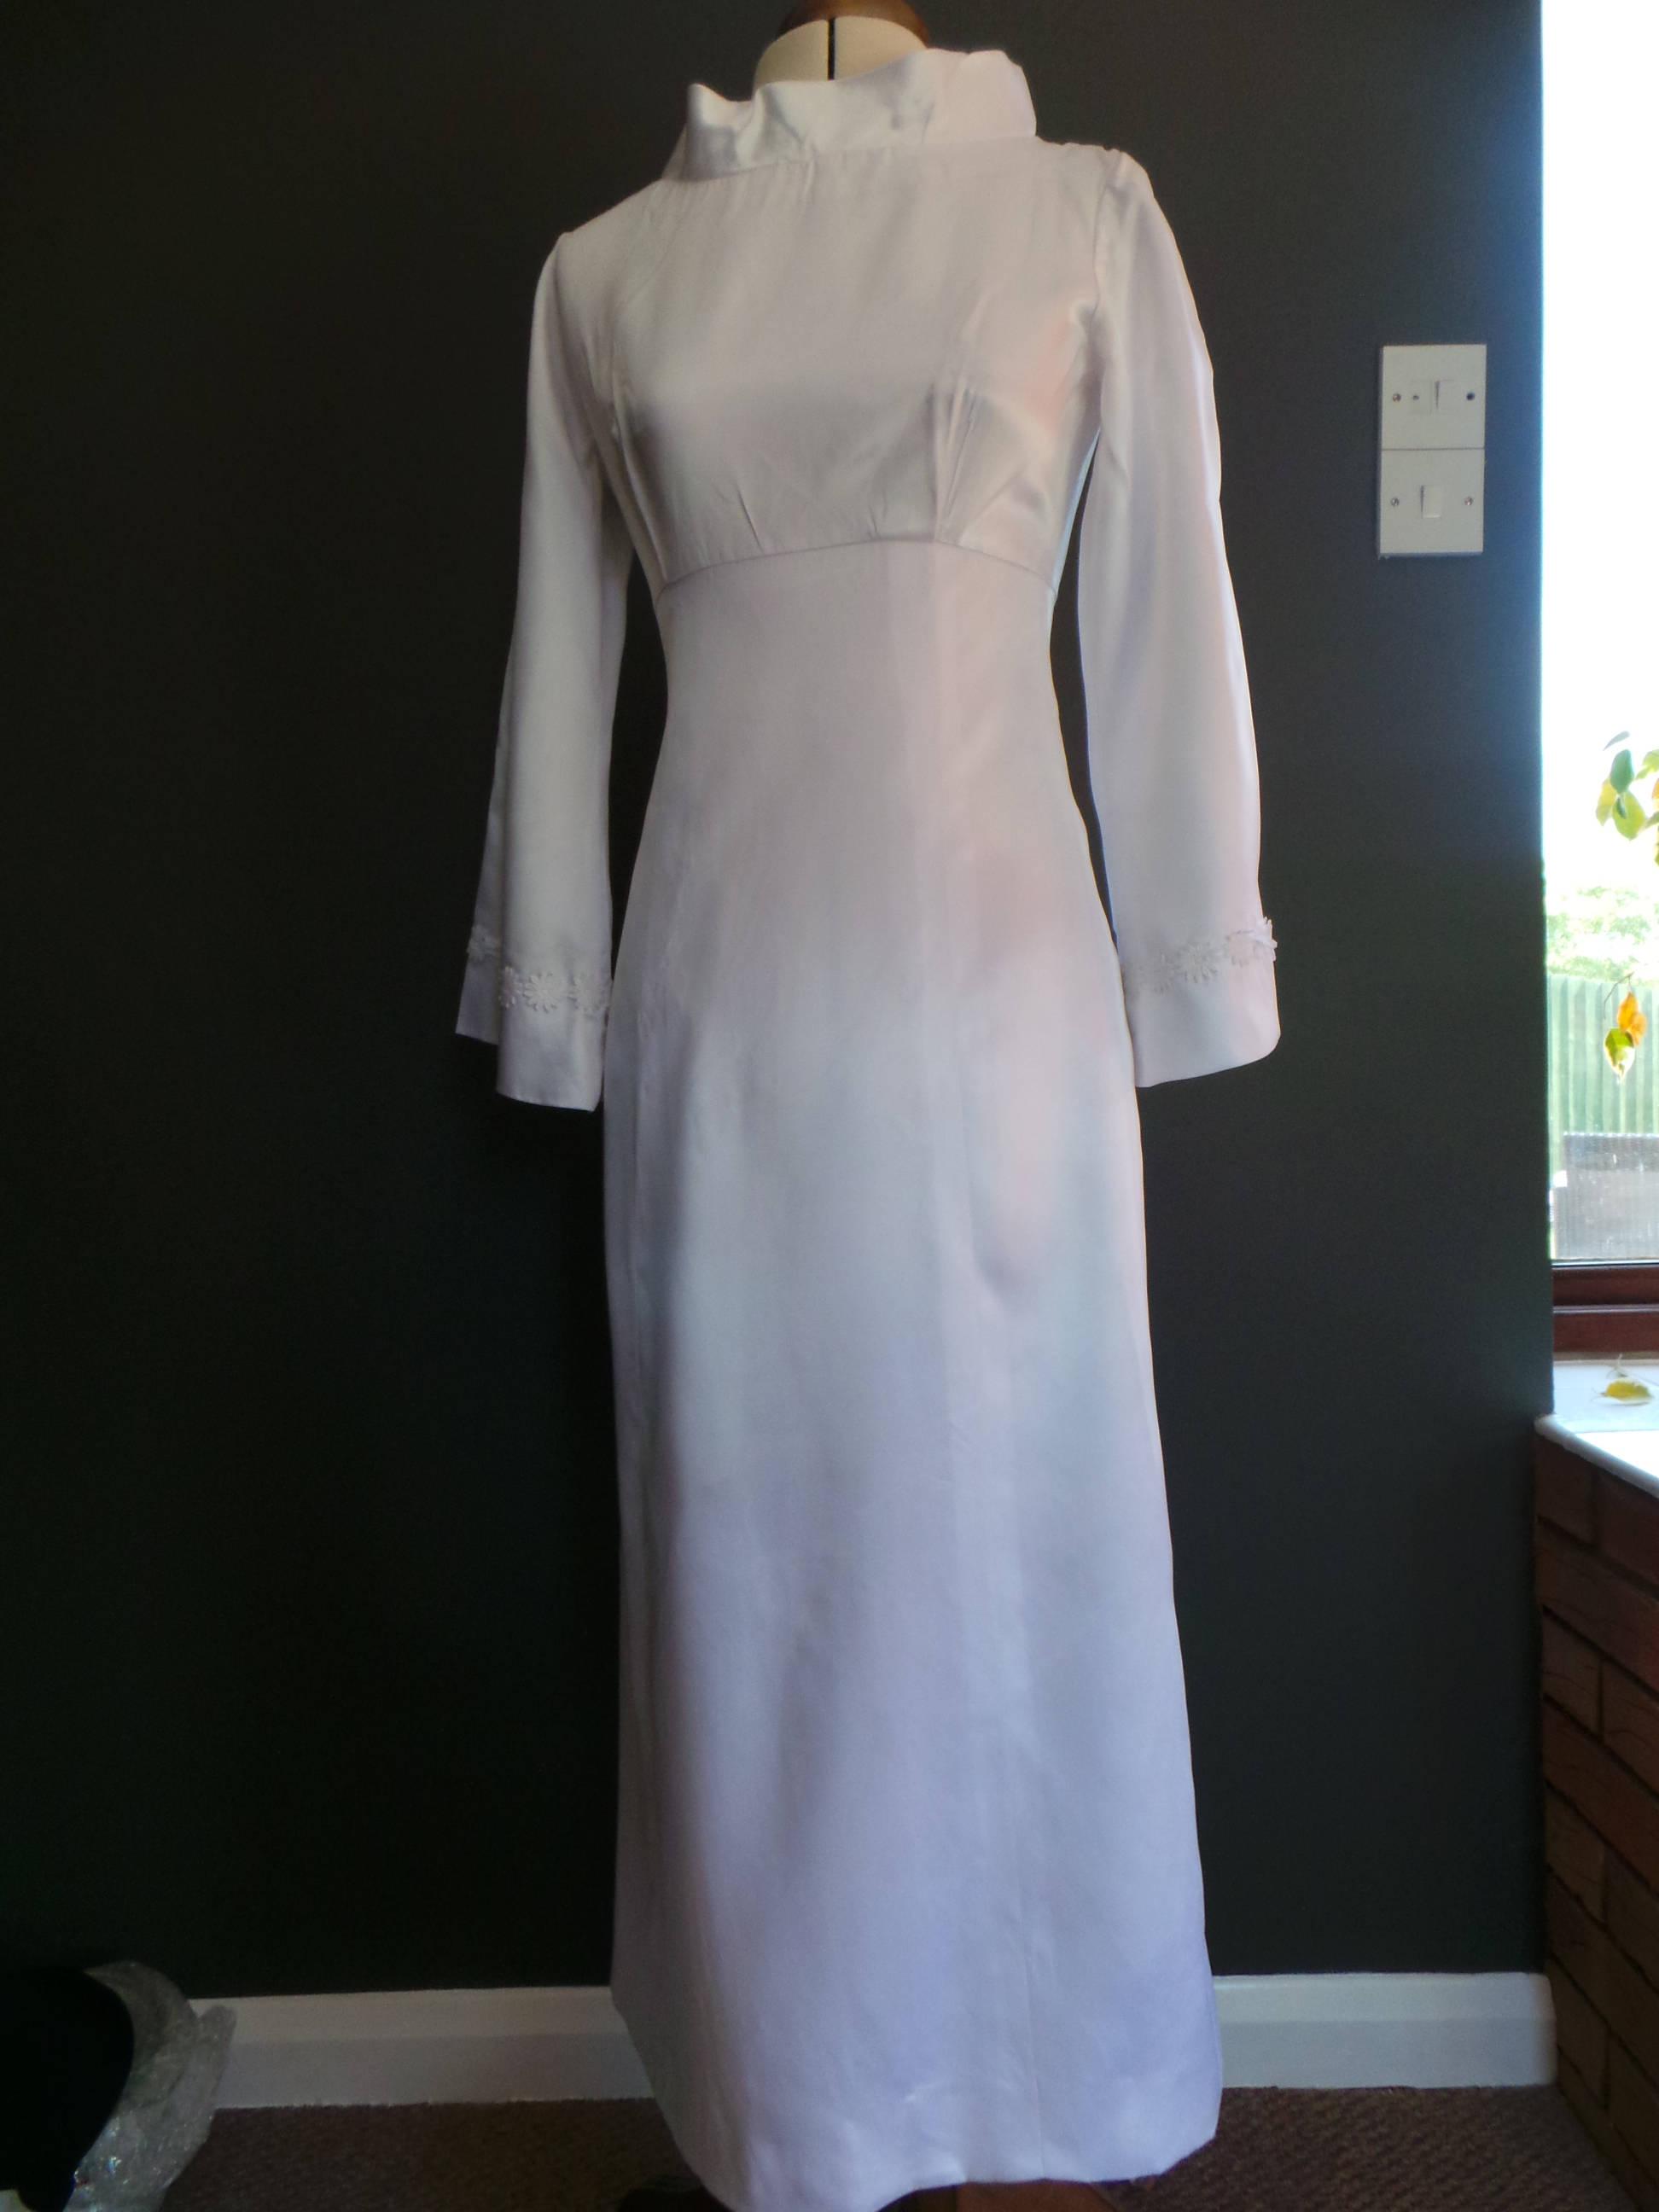 Vintage empire line wedding dress  white satin